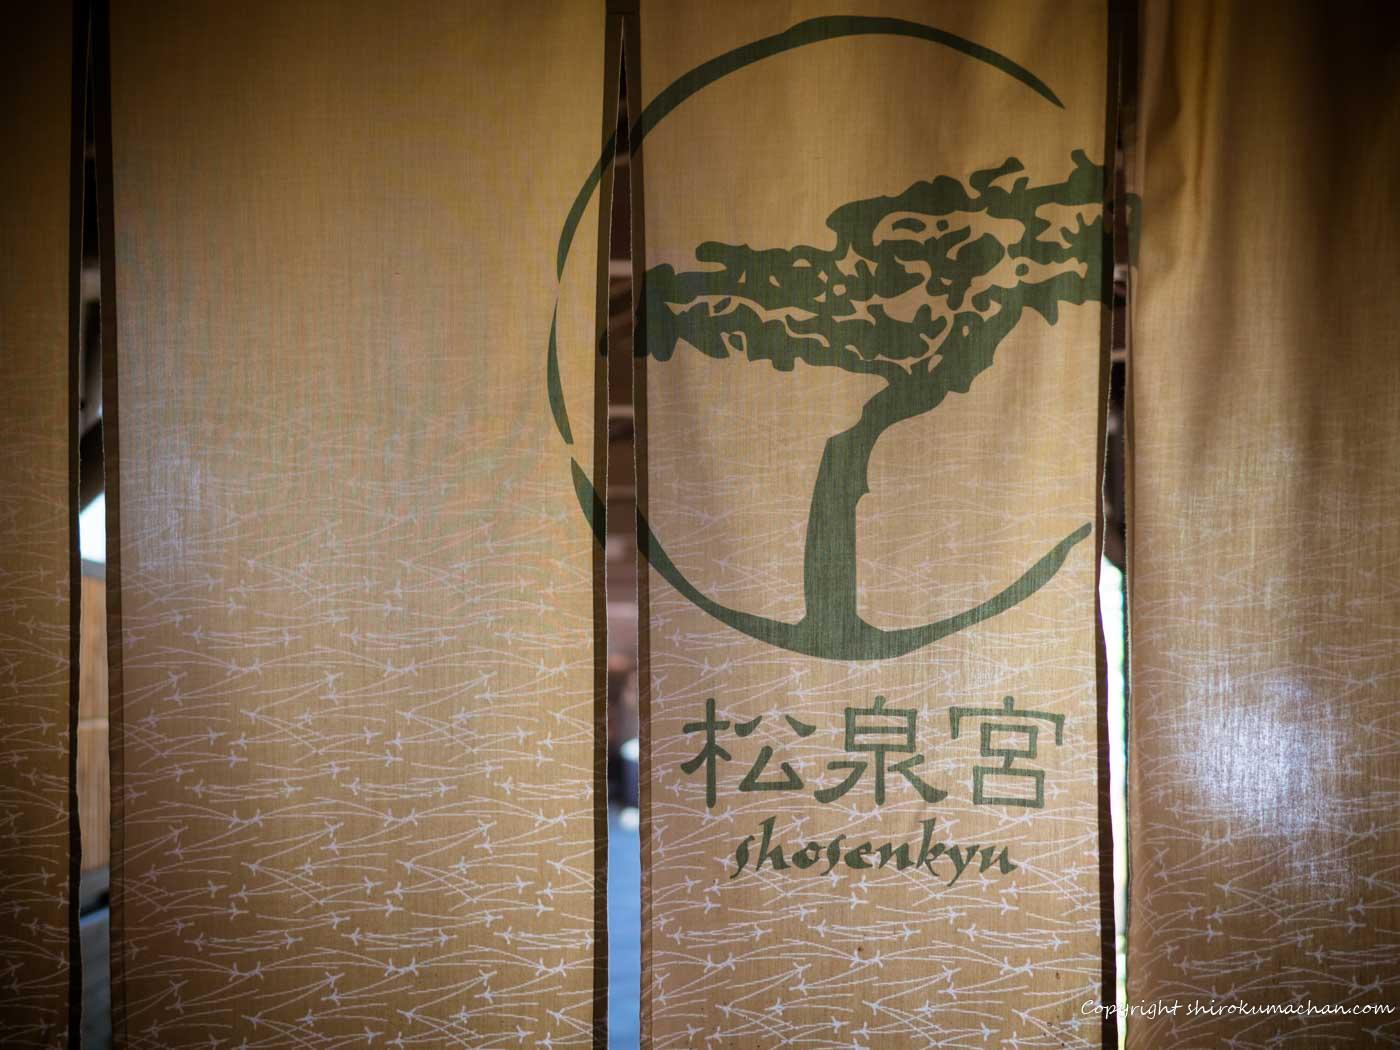 Shosenkyu the hot springs in Sea Gaia Miyazaki